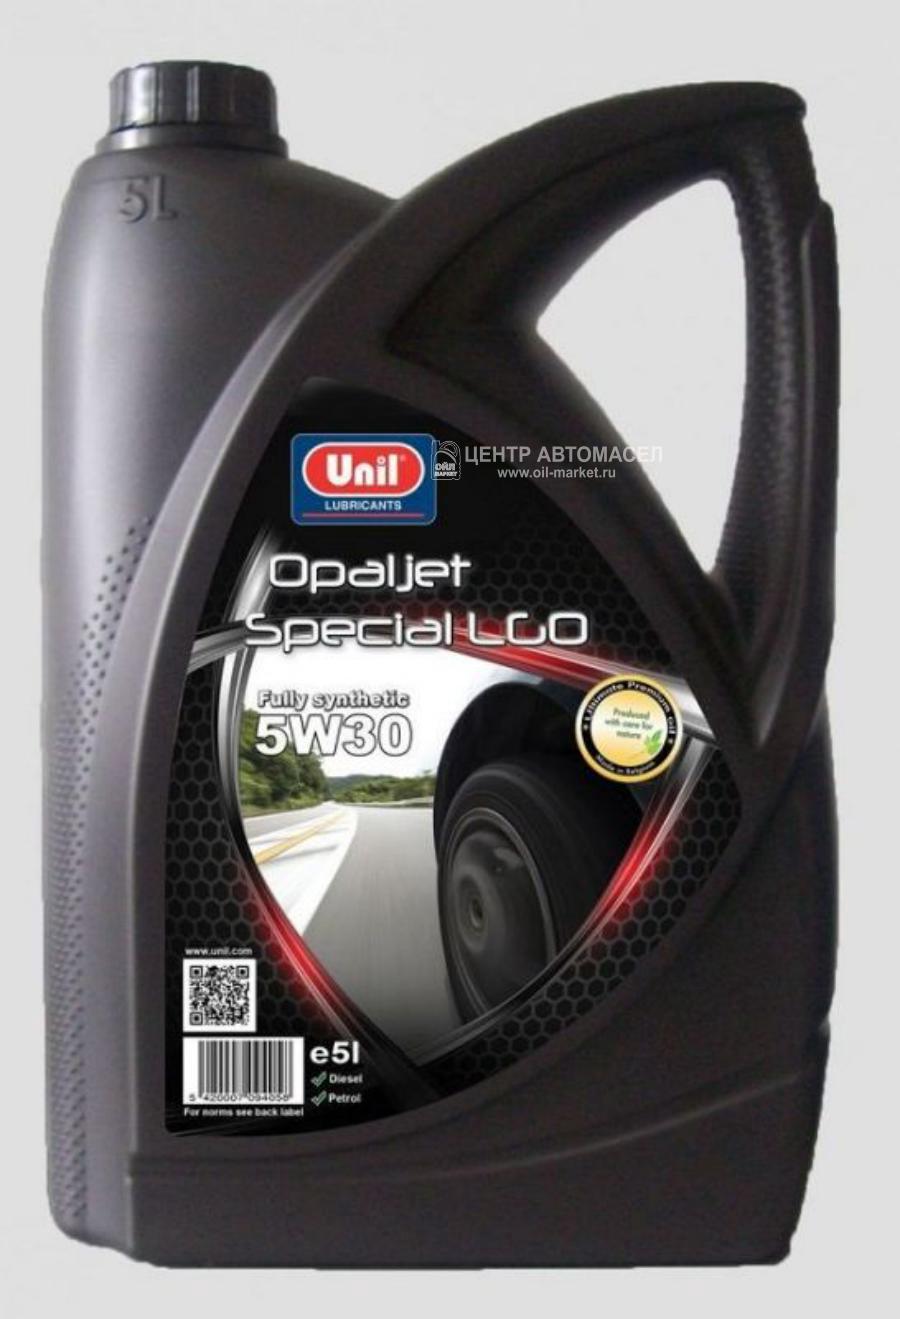 Масло моторное синтетическое Opaljet Special LGO 5W-30, 5л